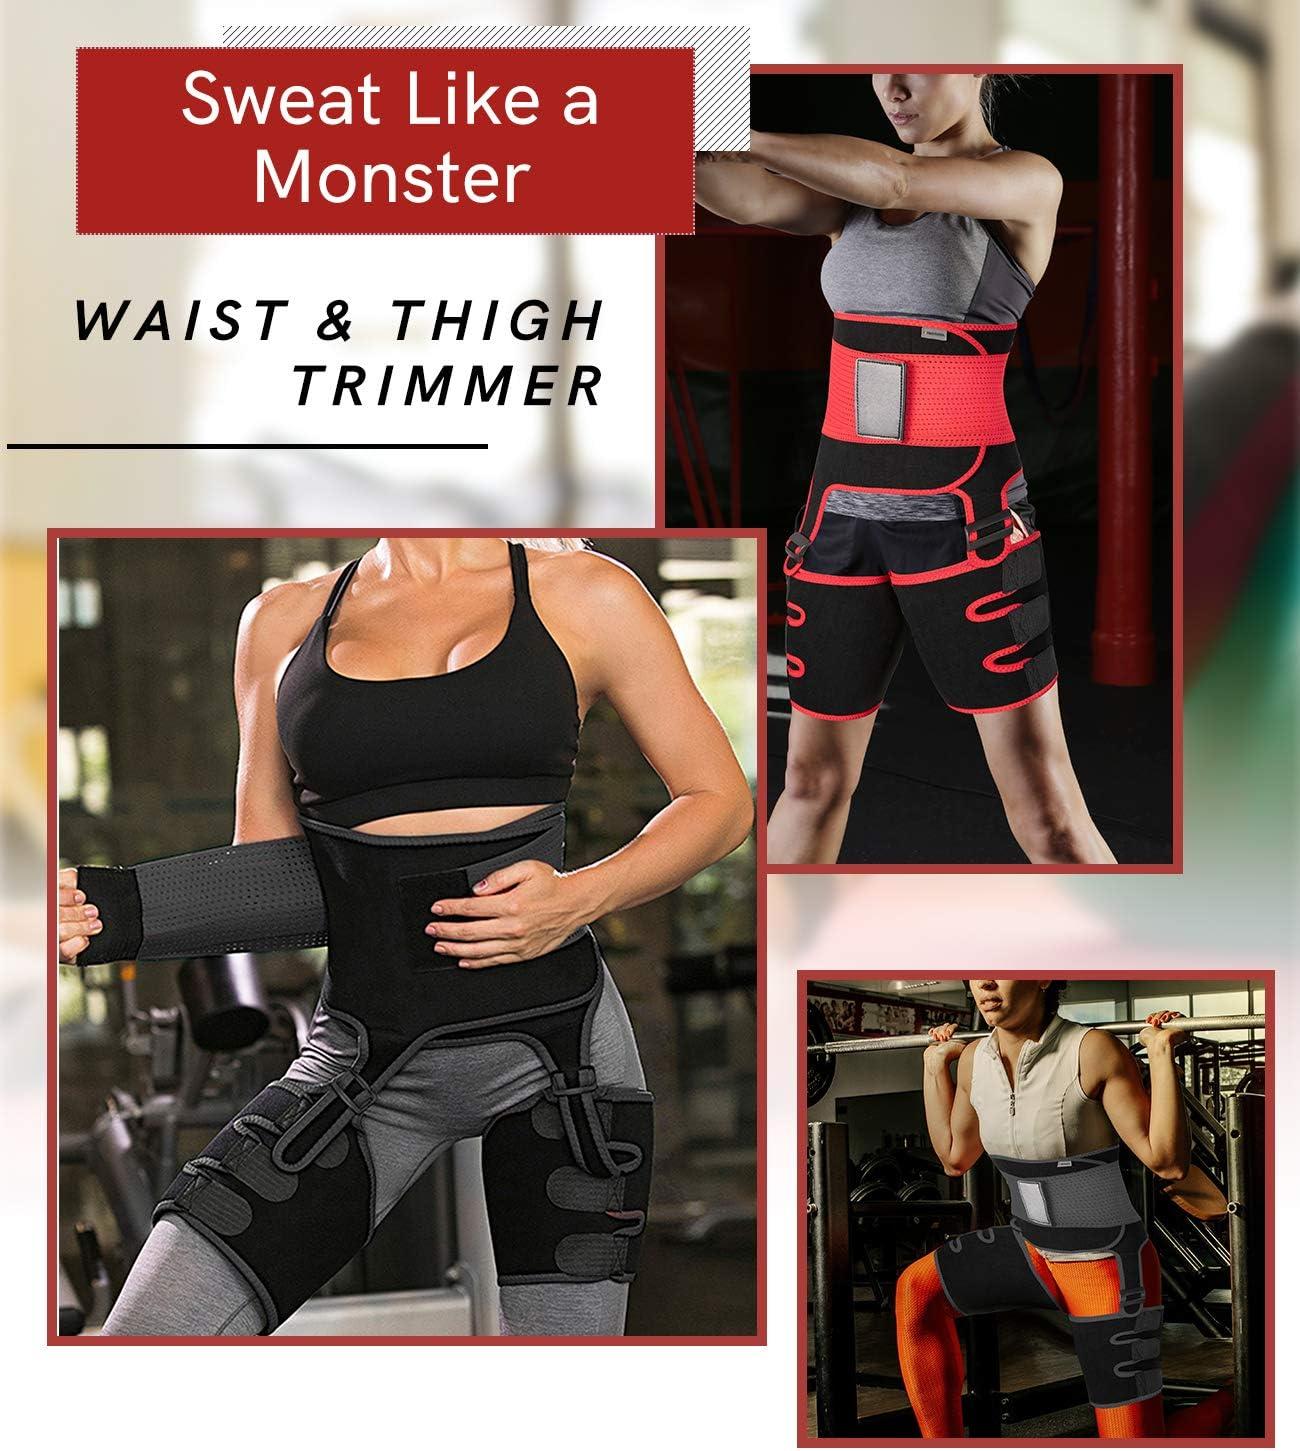 COMFREE 3 in 1 Waist Trainer Faja Reductora Adelgazante Mujer Neopreno Ajustable Cintura Cintur/ón de Sudor Lumbar Butt Lifter